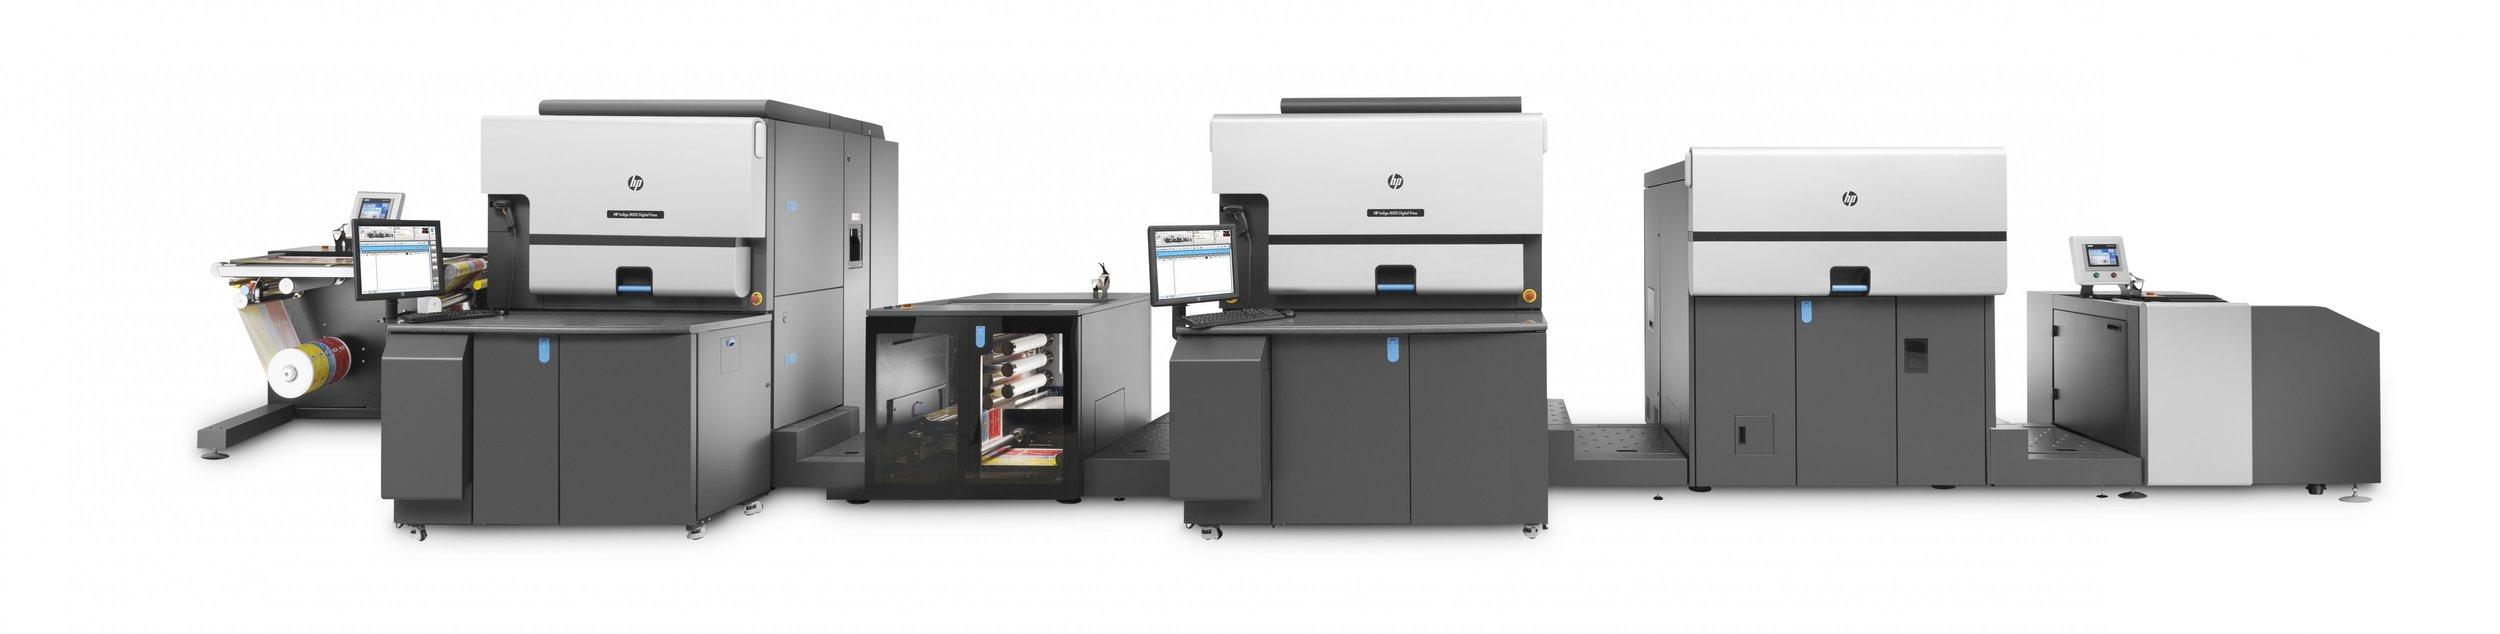 HP-Indigo-8000-Digital-Press1-e1459258872330.jpg